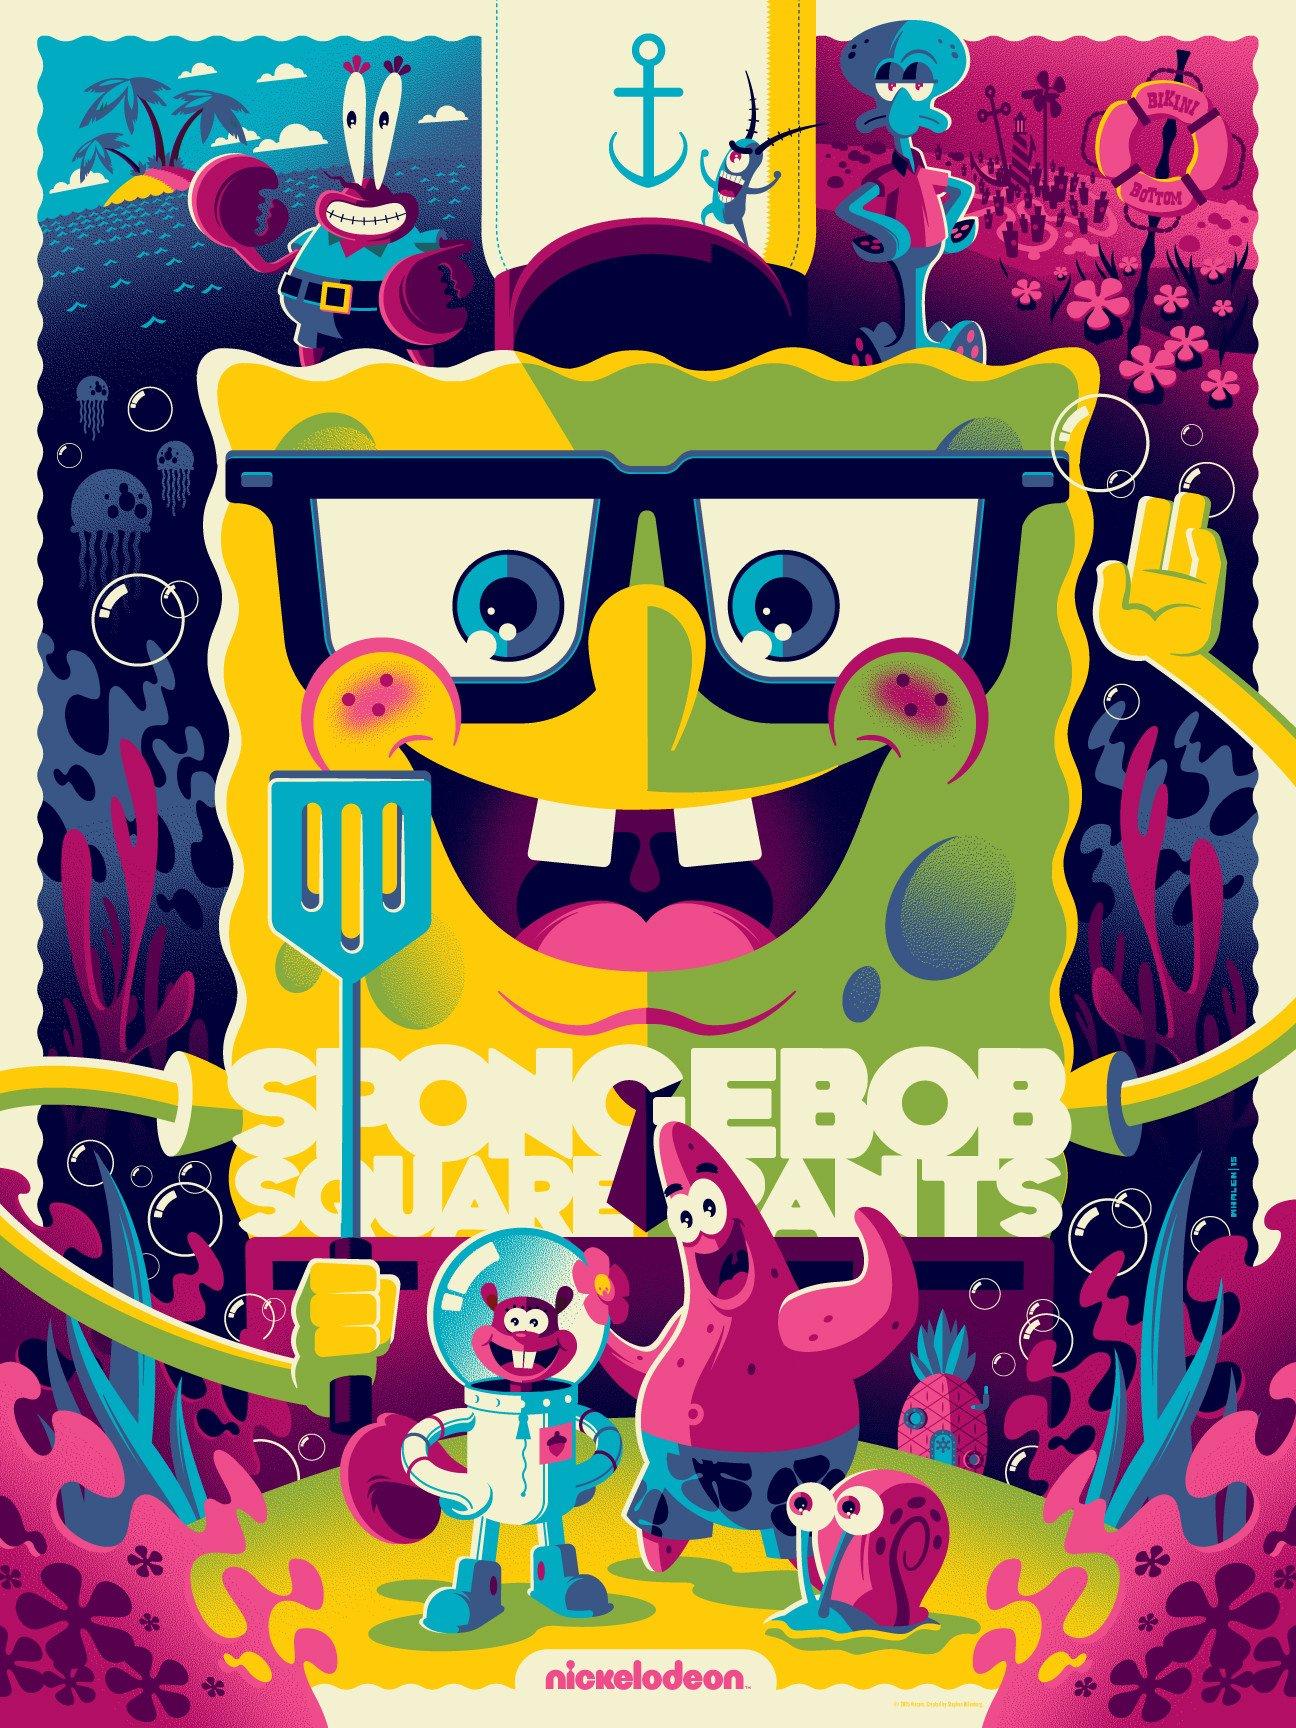 Spongebob Squarepants (Variant) - Poster - Canvas Print ...